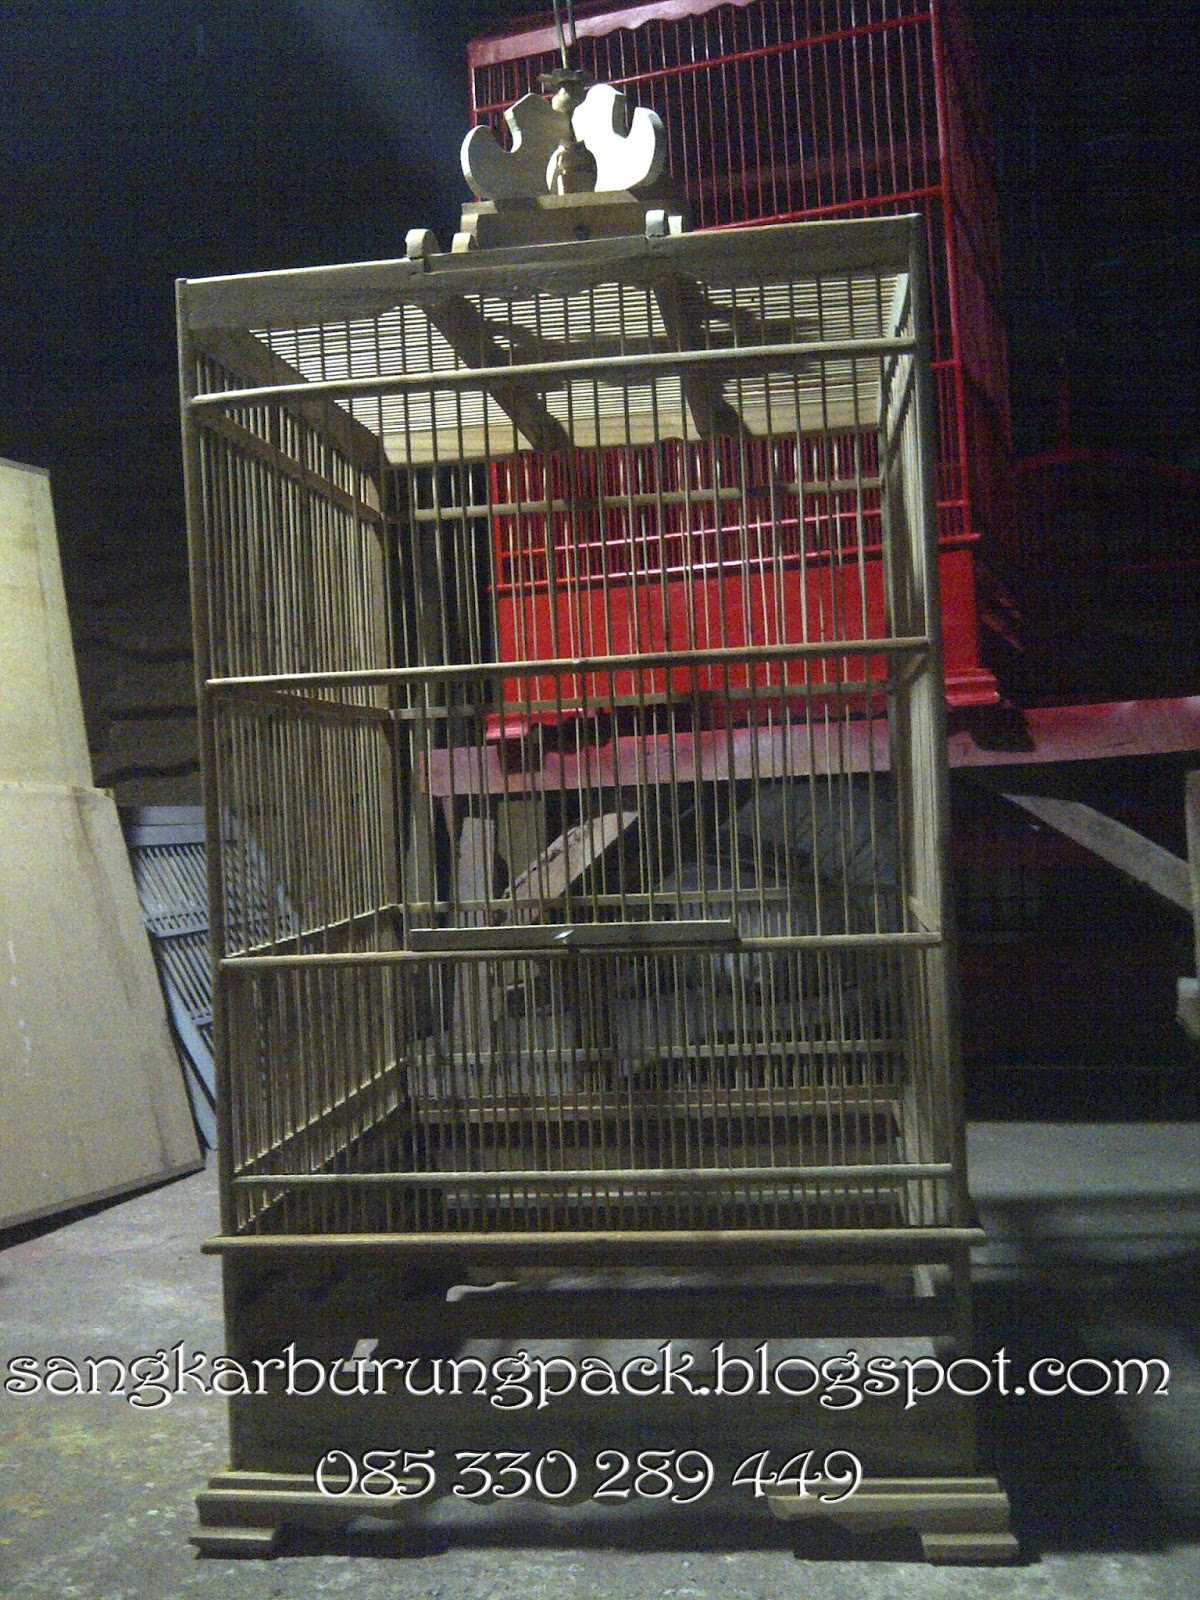 38 Konsep Warna Cat Sangkar Burung Warna Cat